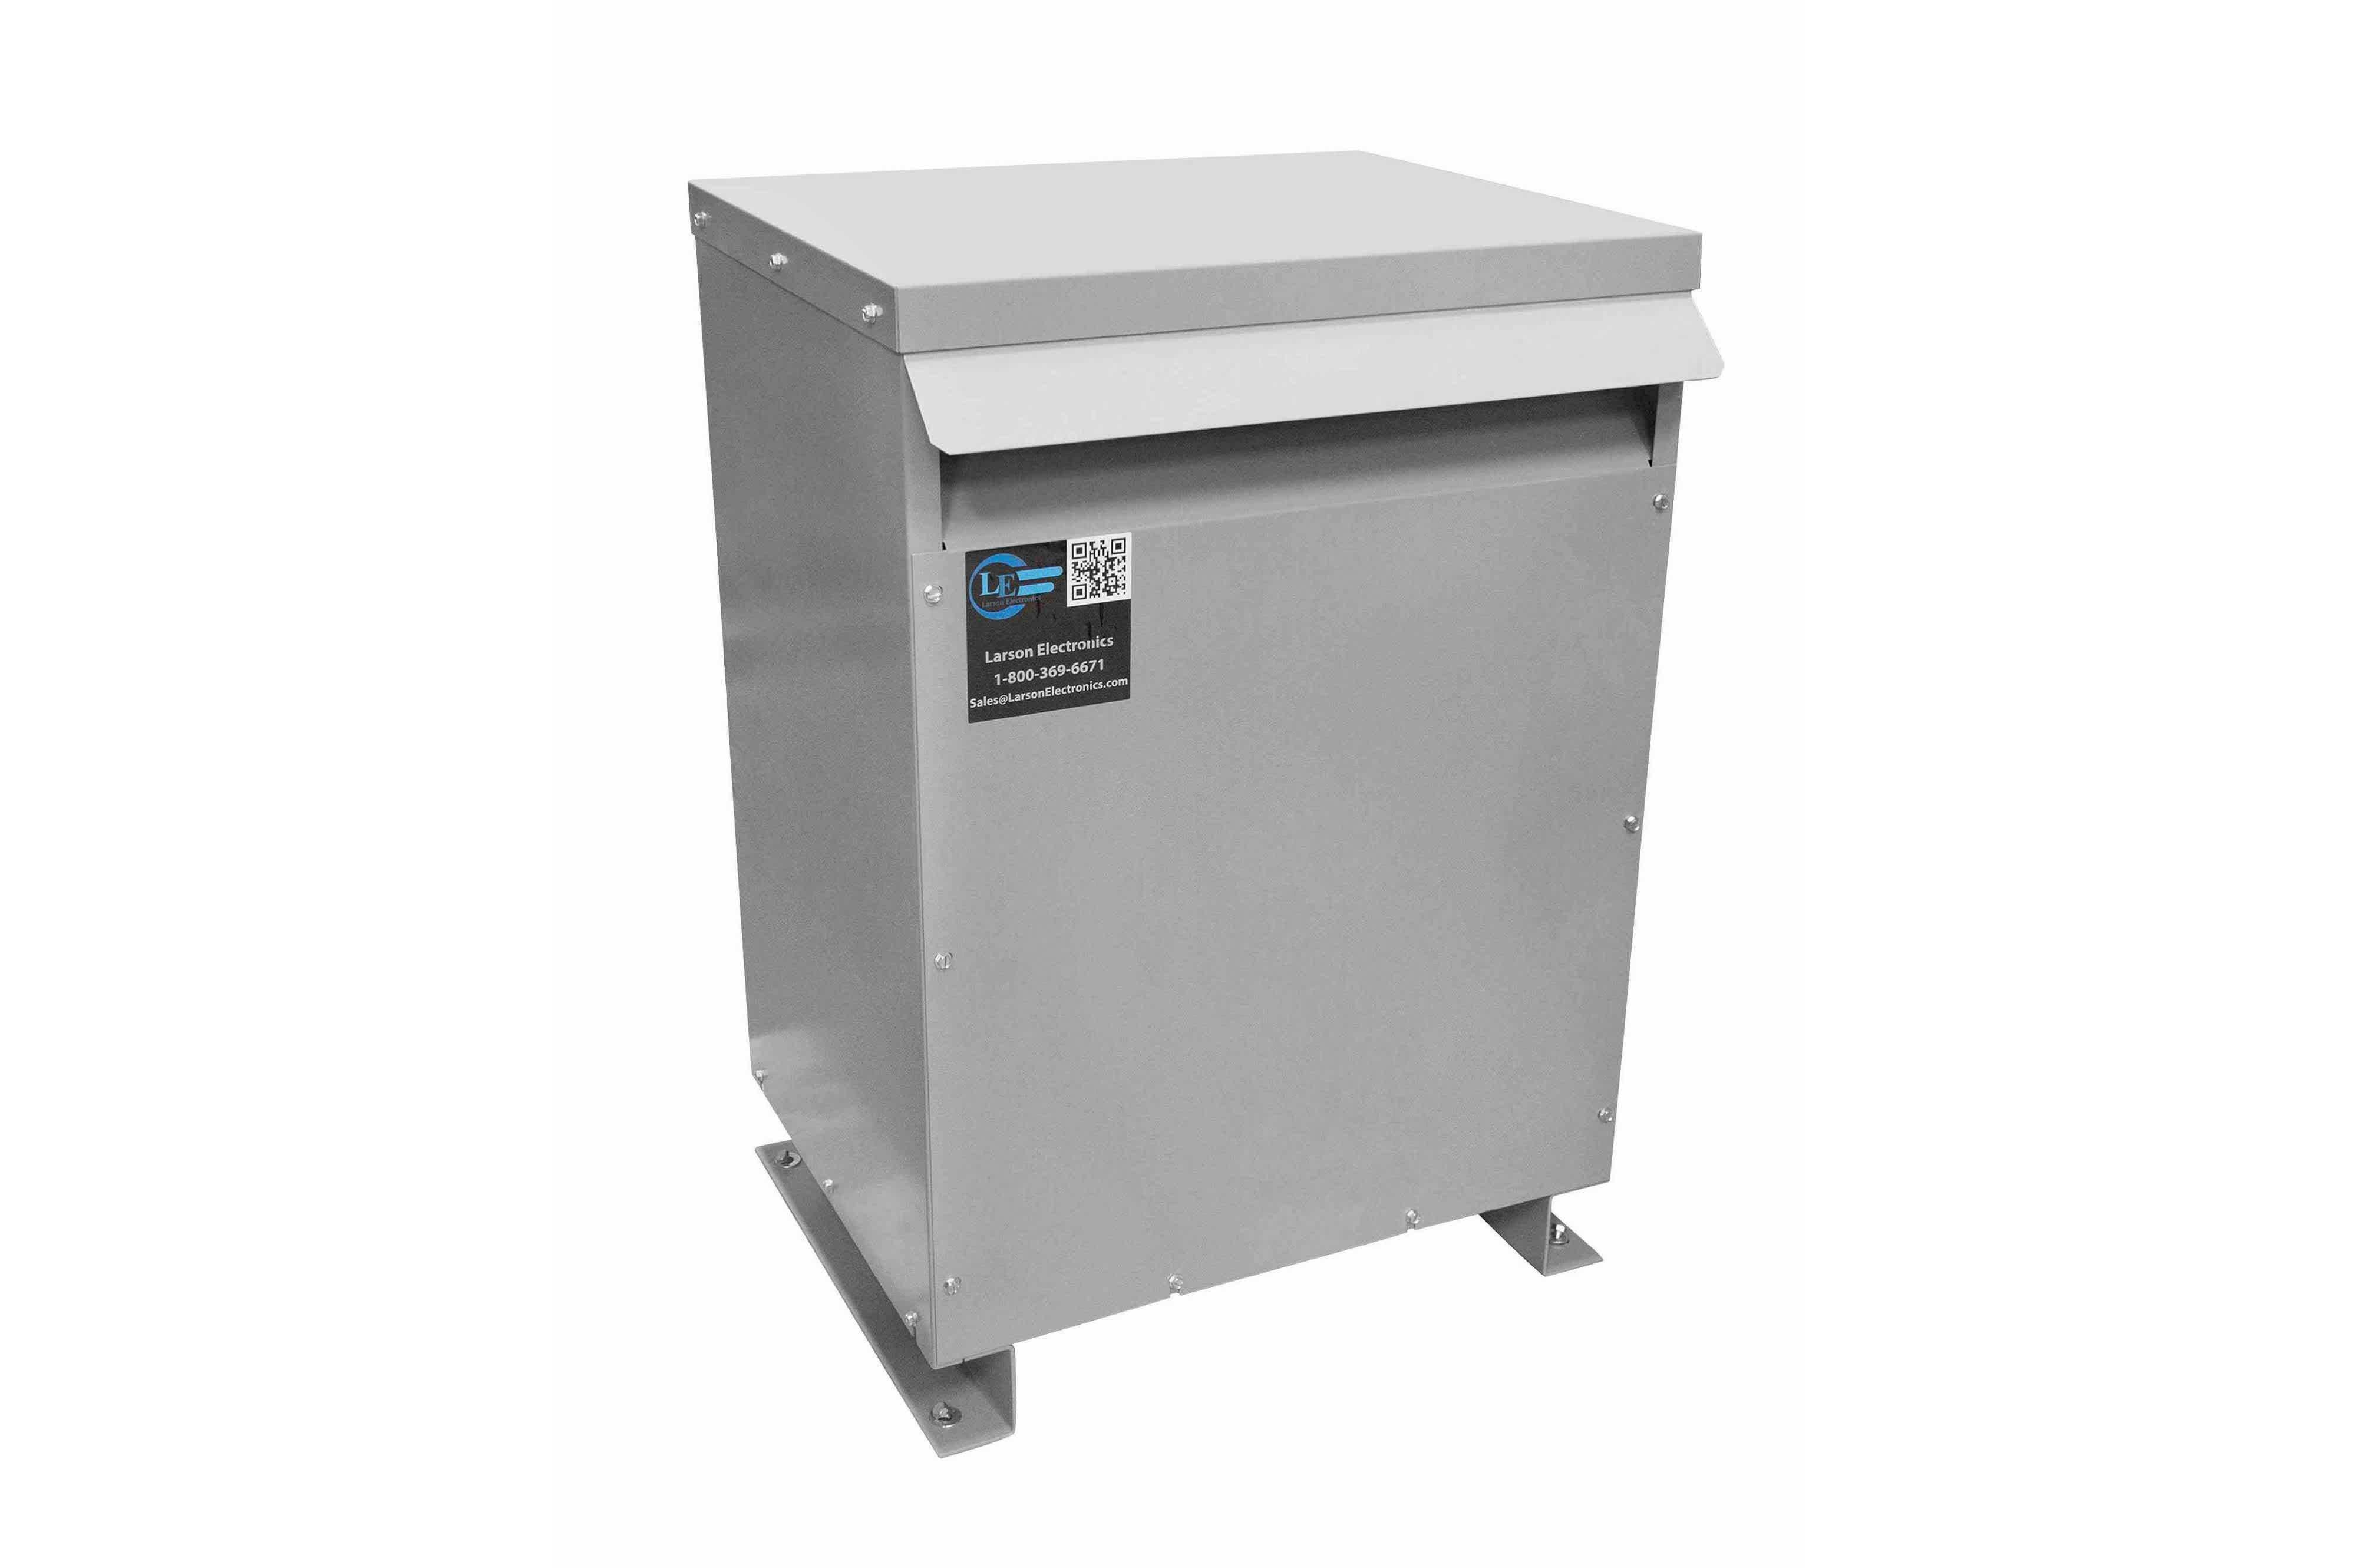 200 kVA 3PH Isolation Transformer, 575V Wye Primary, 240V/120 Delta Secondary, N3R, Ventilated, 60 Hz